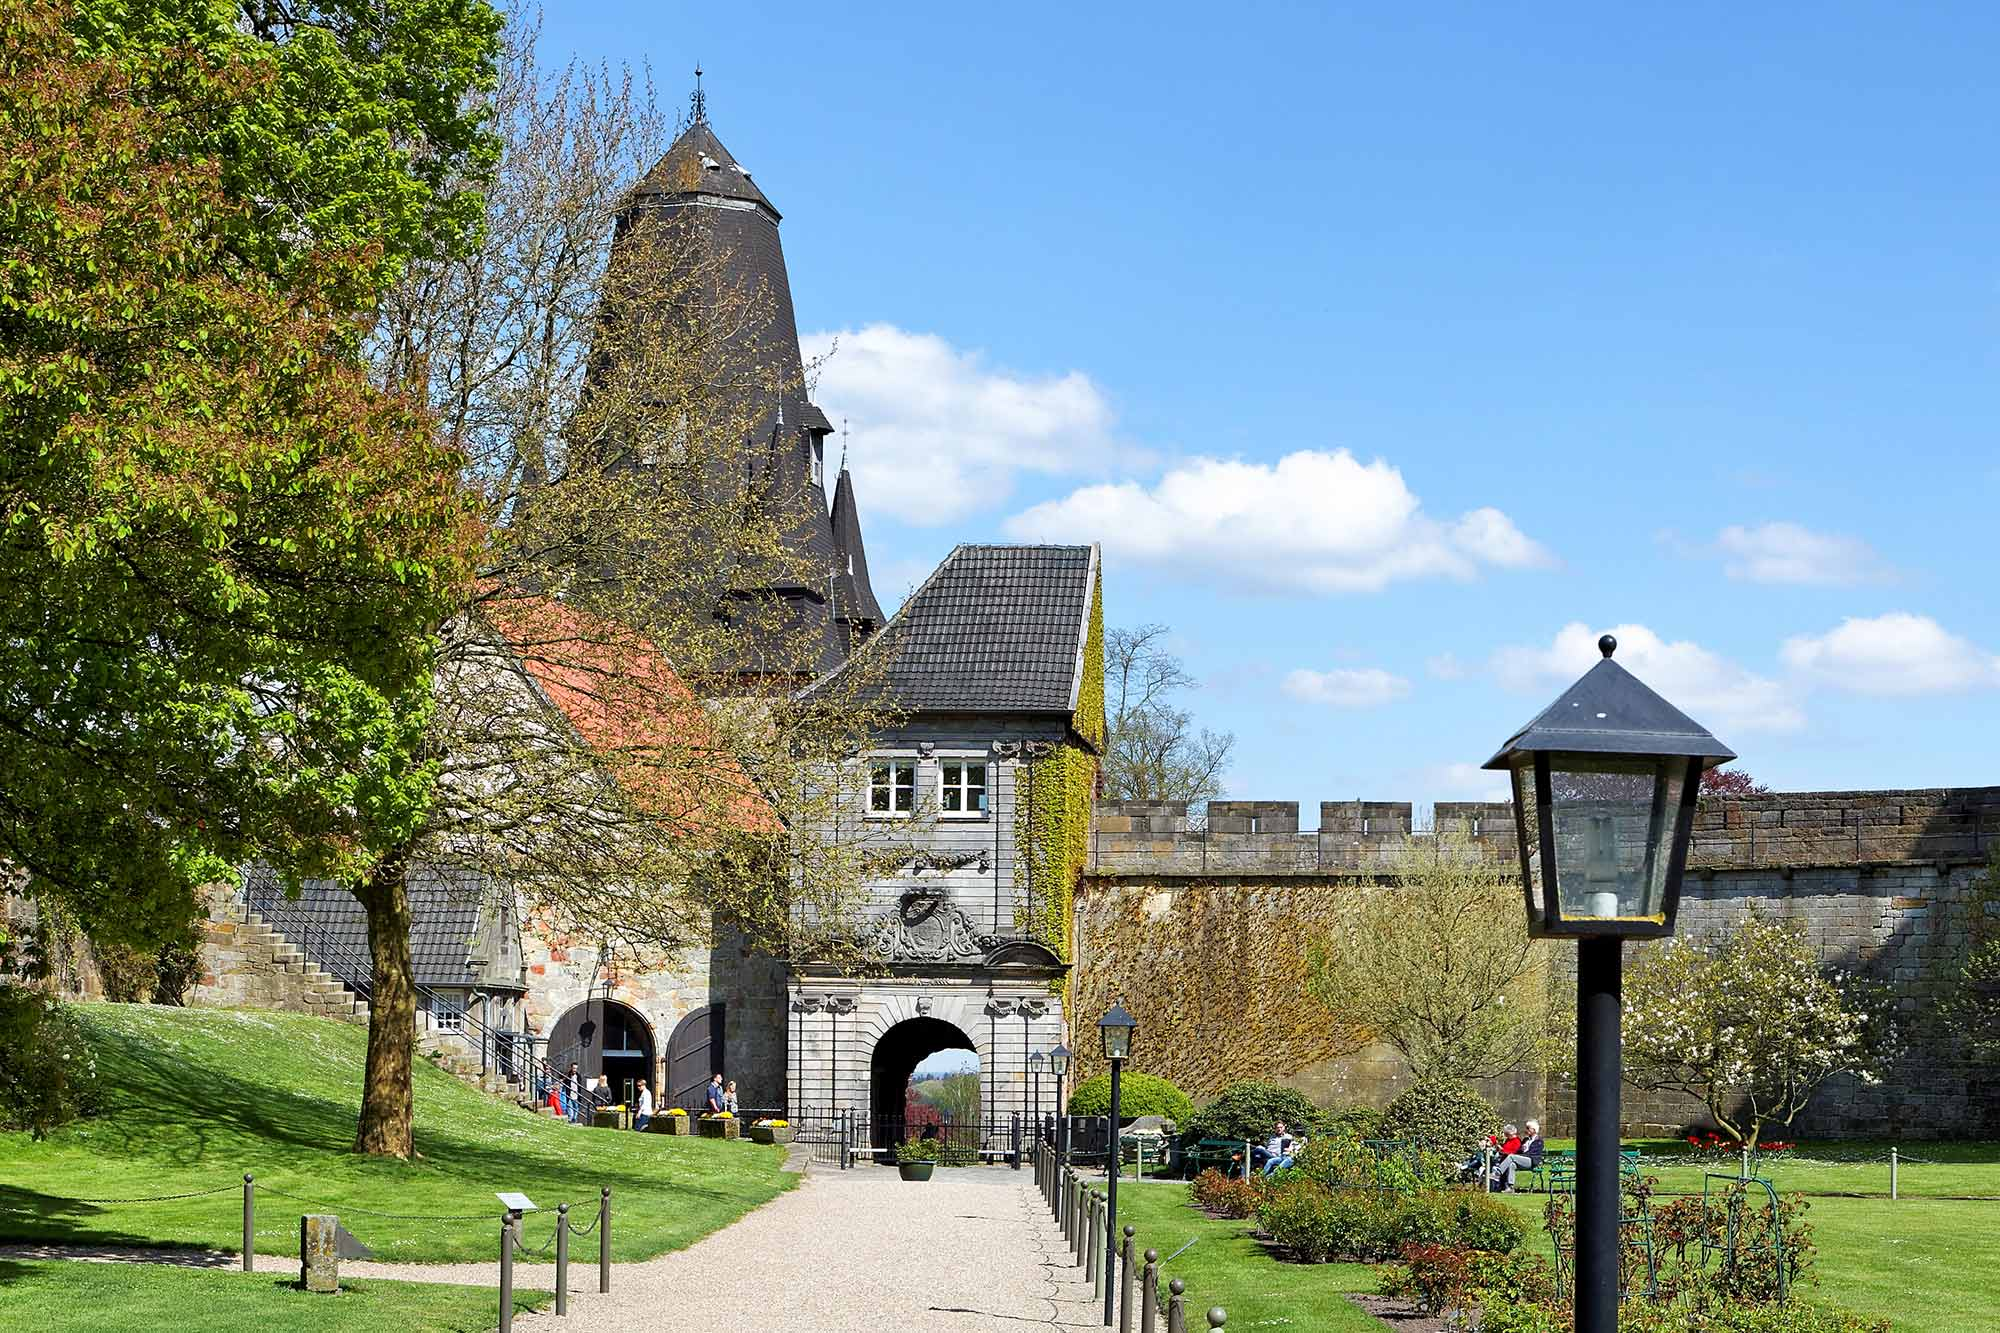 Ingang tot kasteel Bentheim  ©Andreas Richter